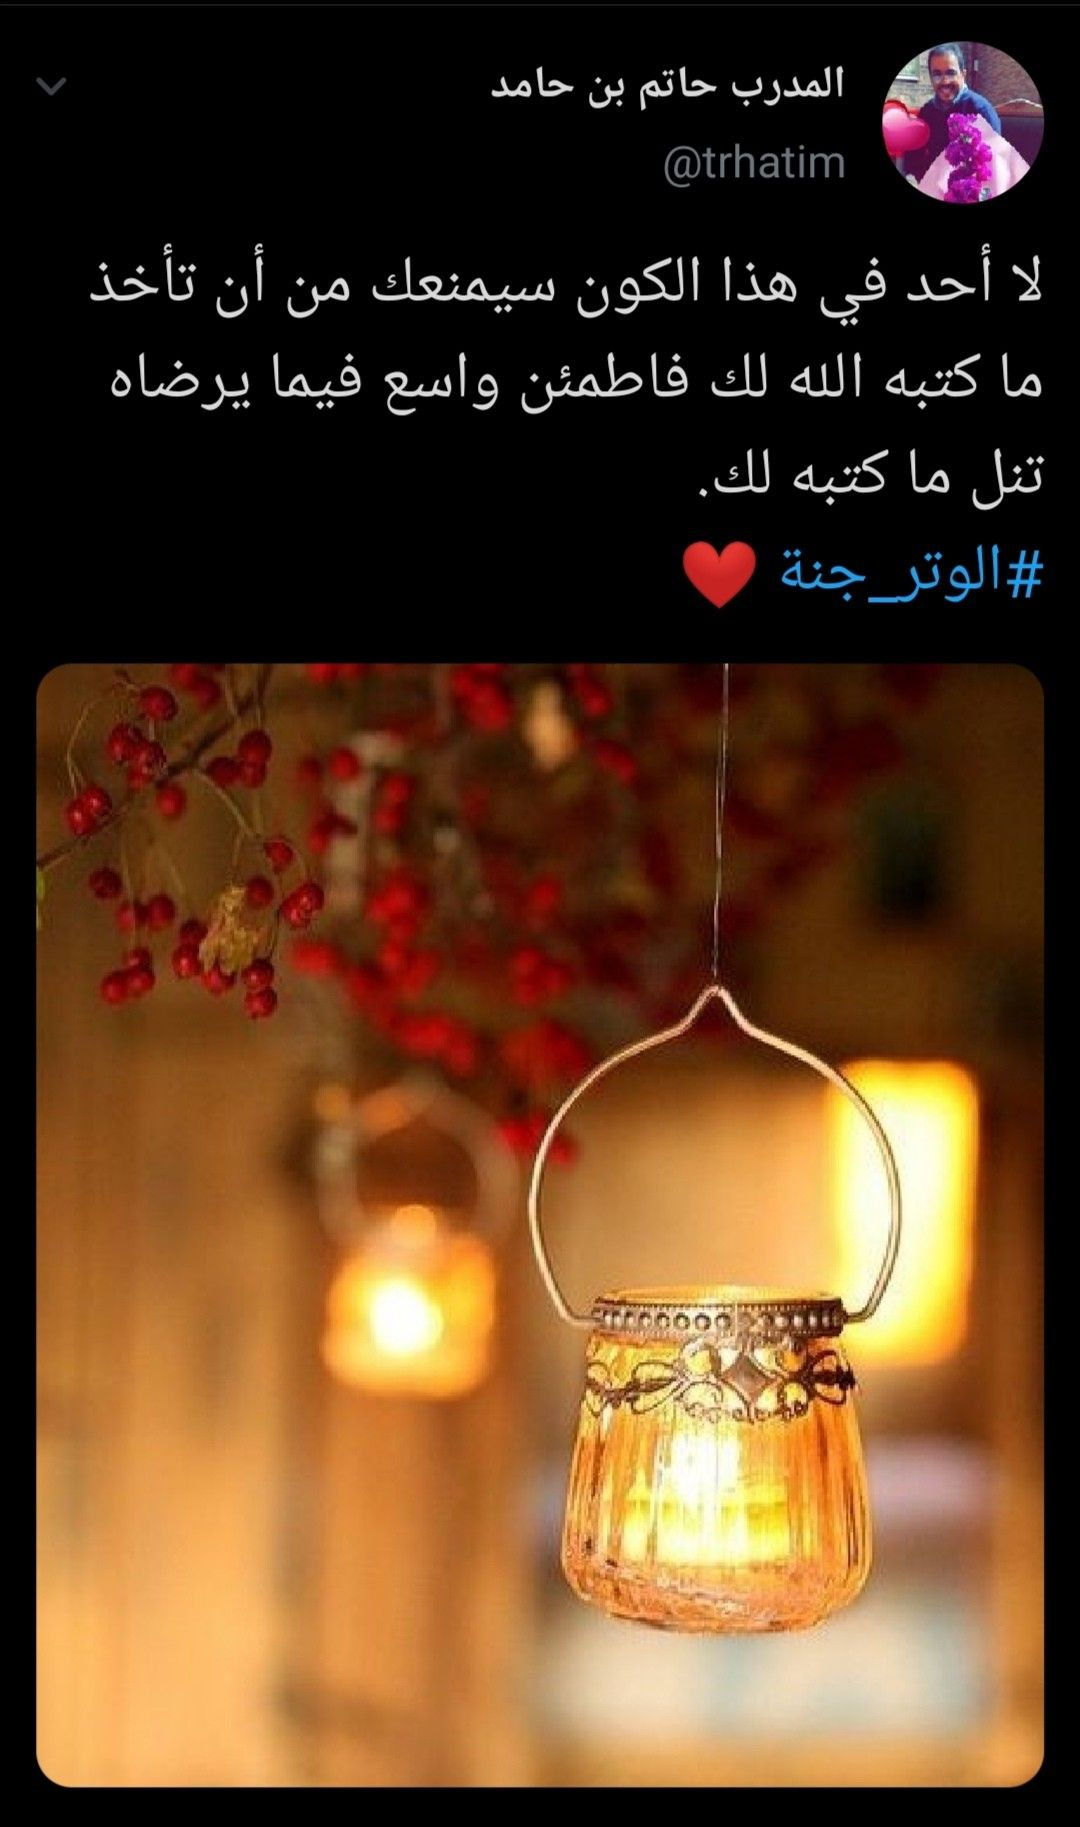 Pin By Hatim Bin Hamed On الوتر جنة القلوب Decor Home Decor Lamp